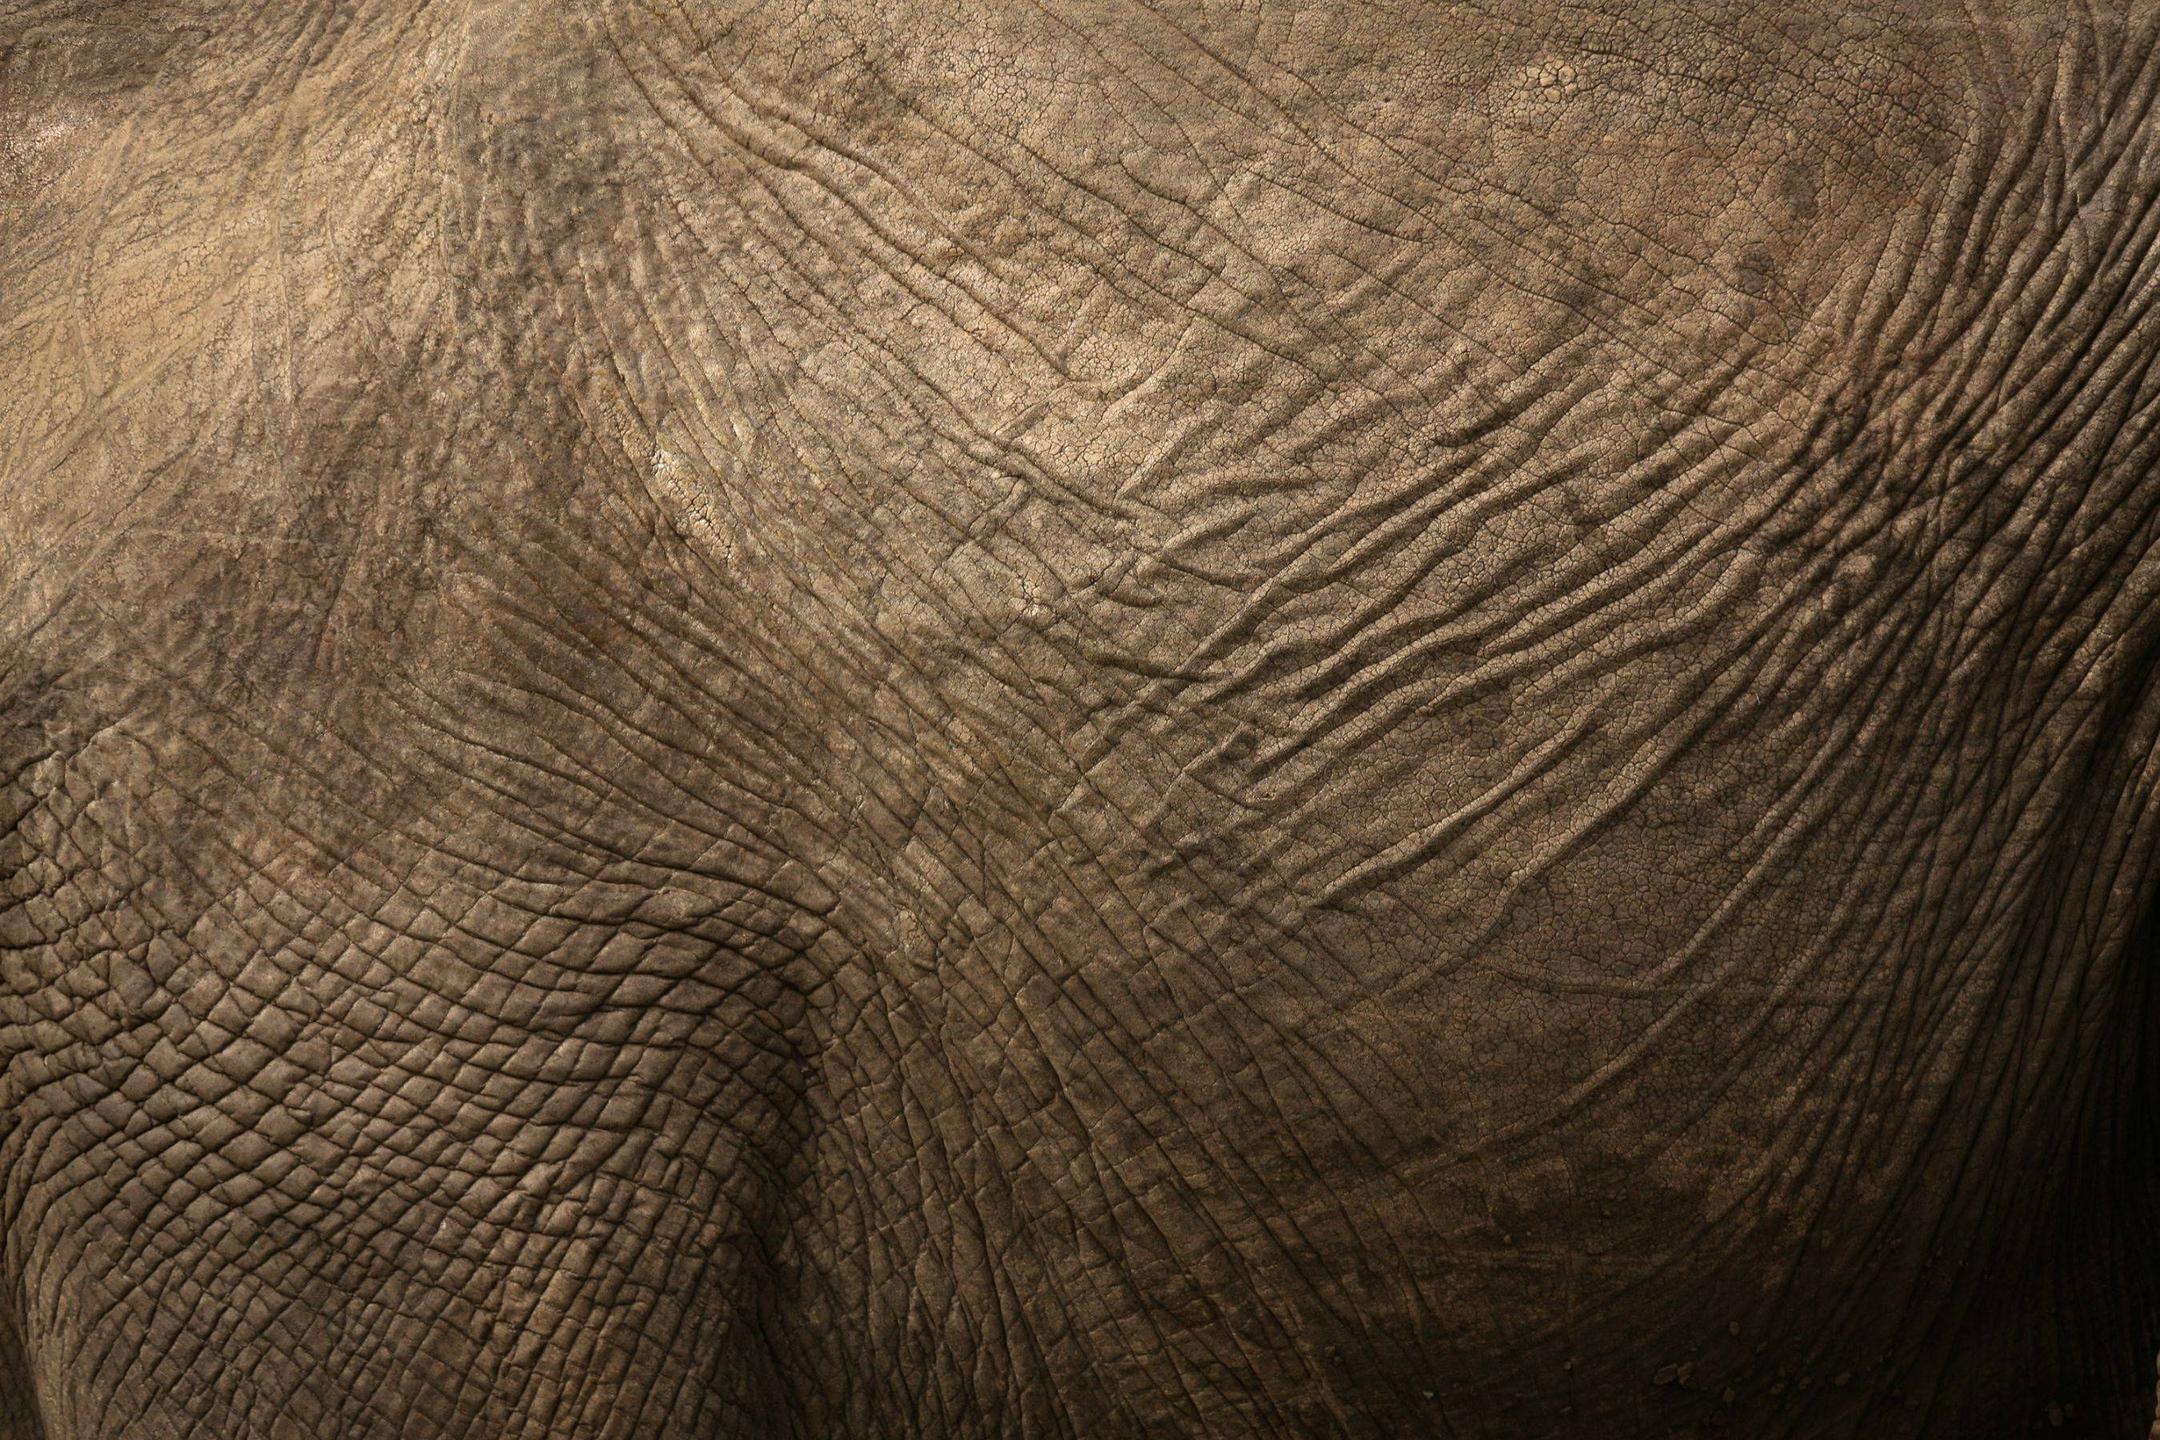 Elephant Hide [3000x2000] Wallpaper Wallpapers Pictures Piccit 2160x1440